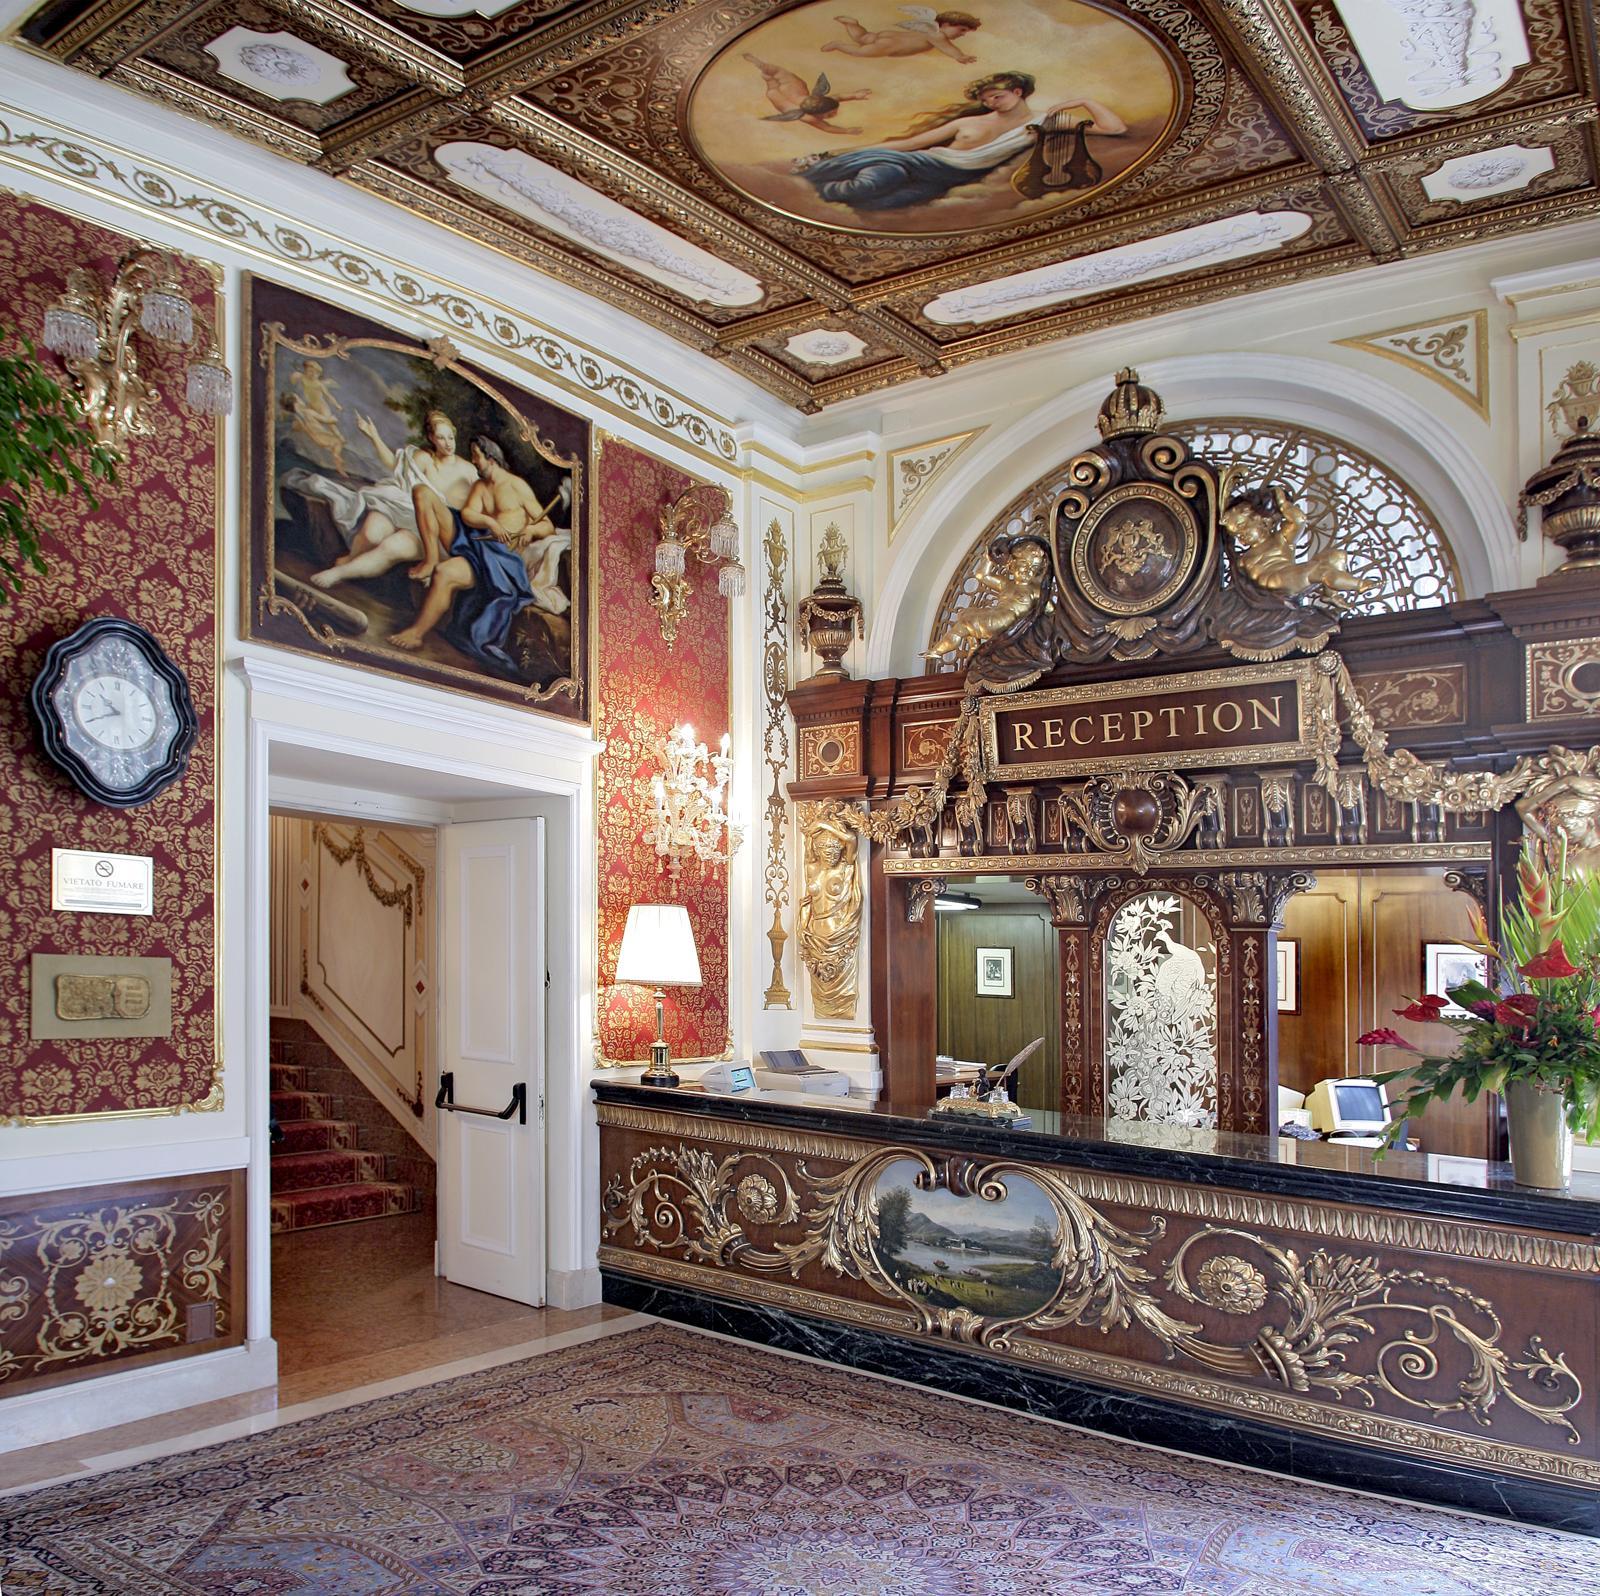 Grand Hotel Des Iles Borromees Deluxe Escapesdeluxe Escapes